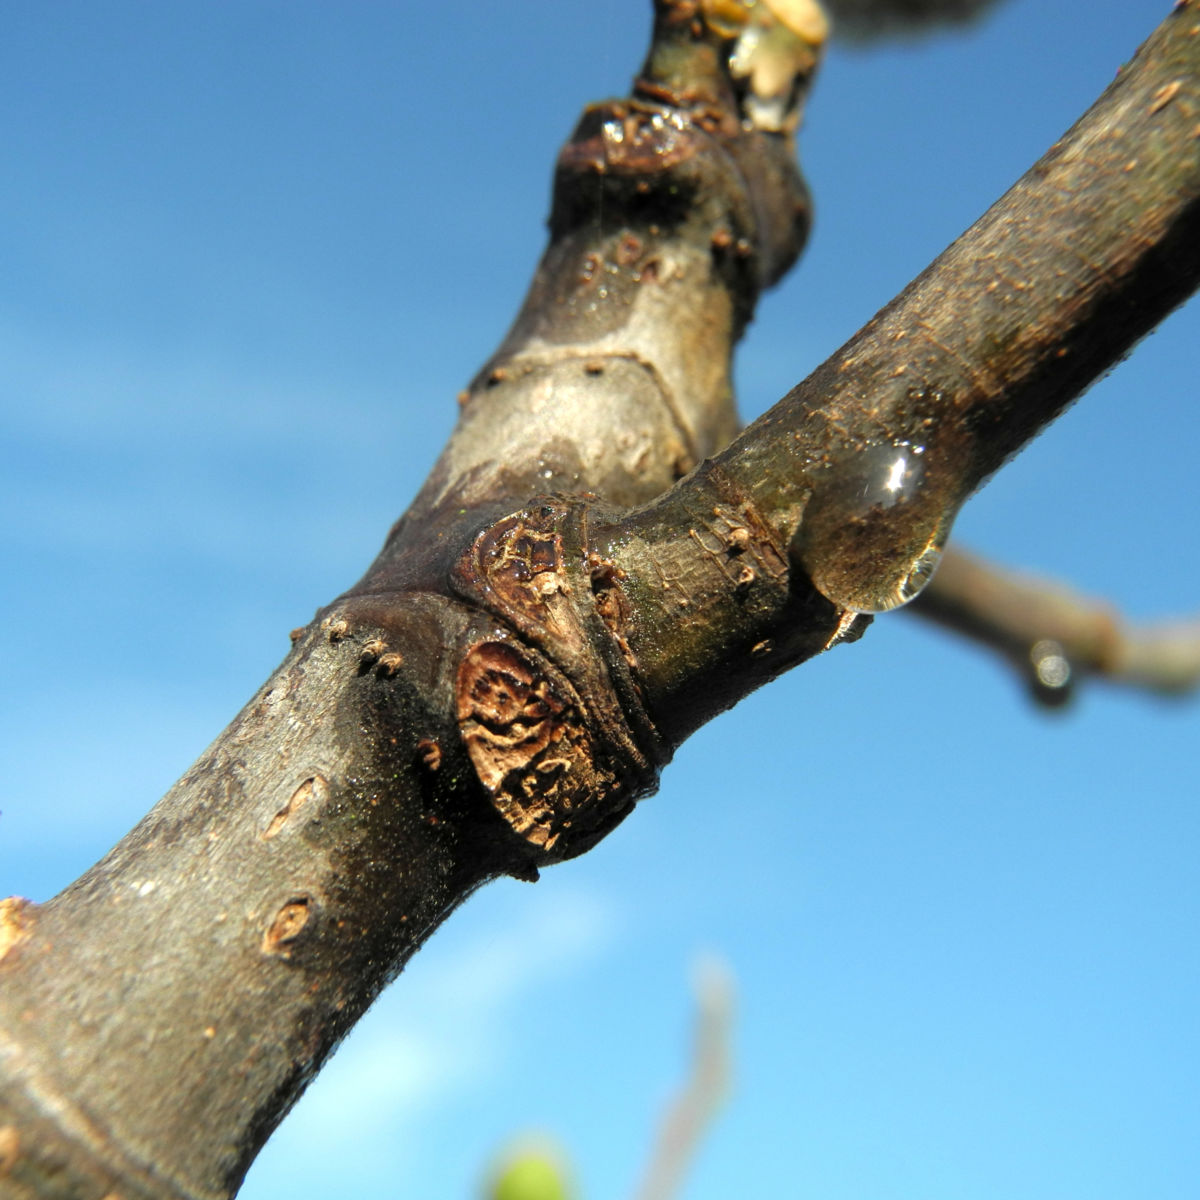 Echter Feigenbaum Rinde braun Ficus carica